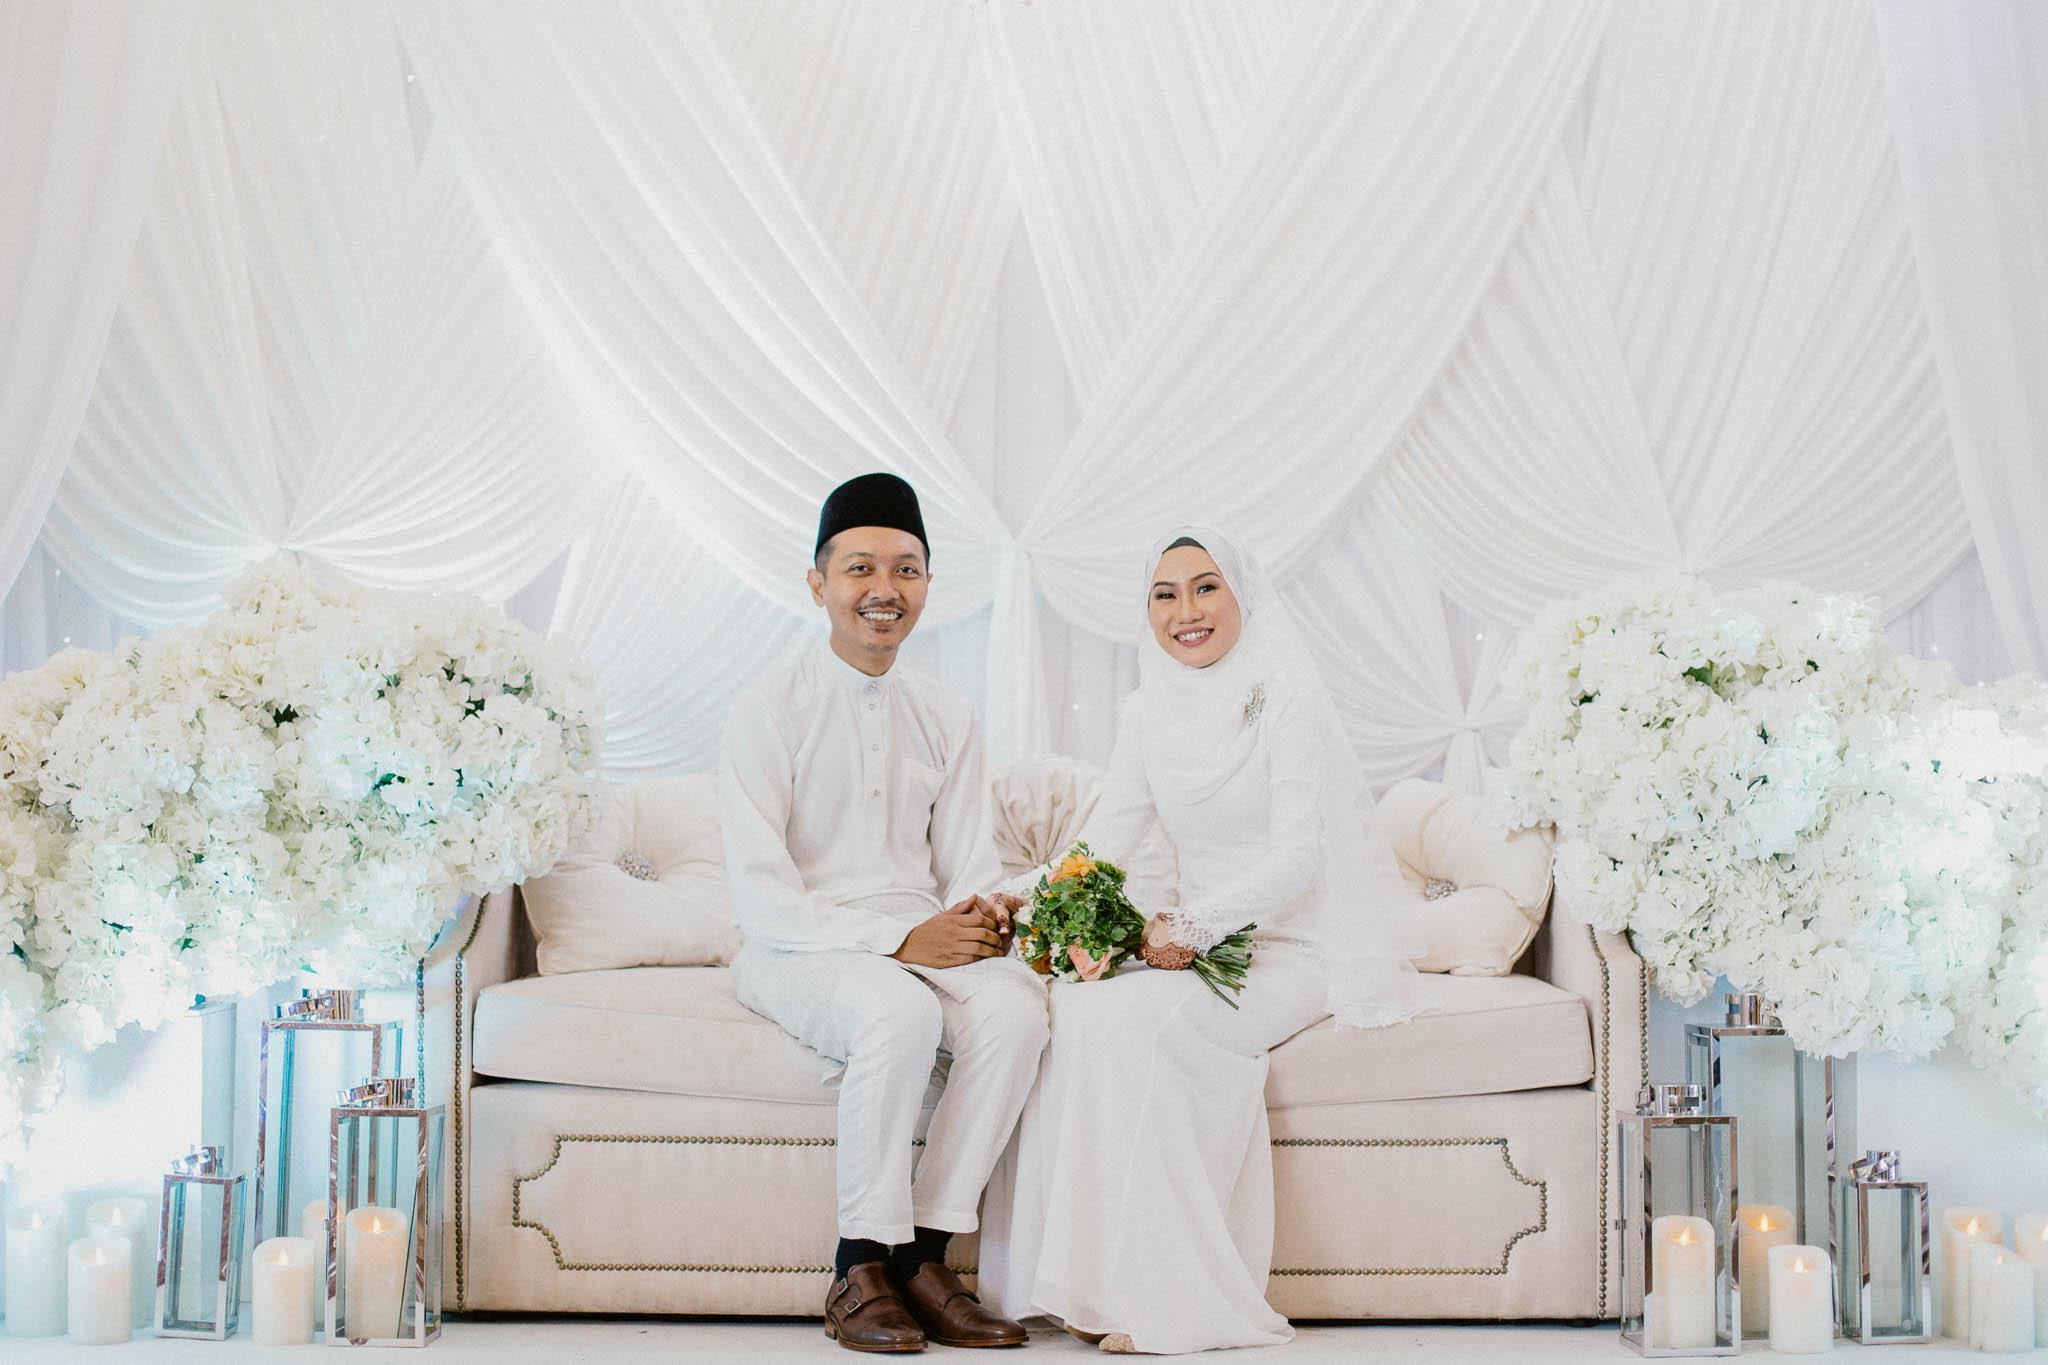 singapore-wedding-photographer-addafiq-nufail-035.jpg